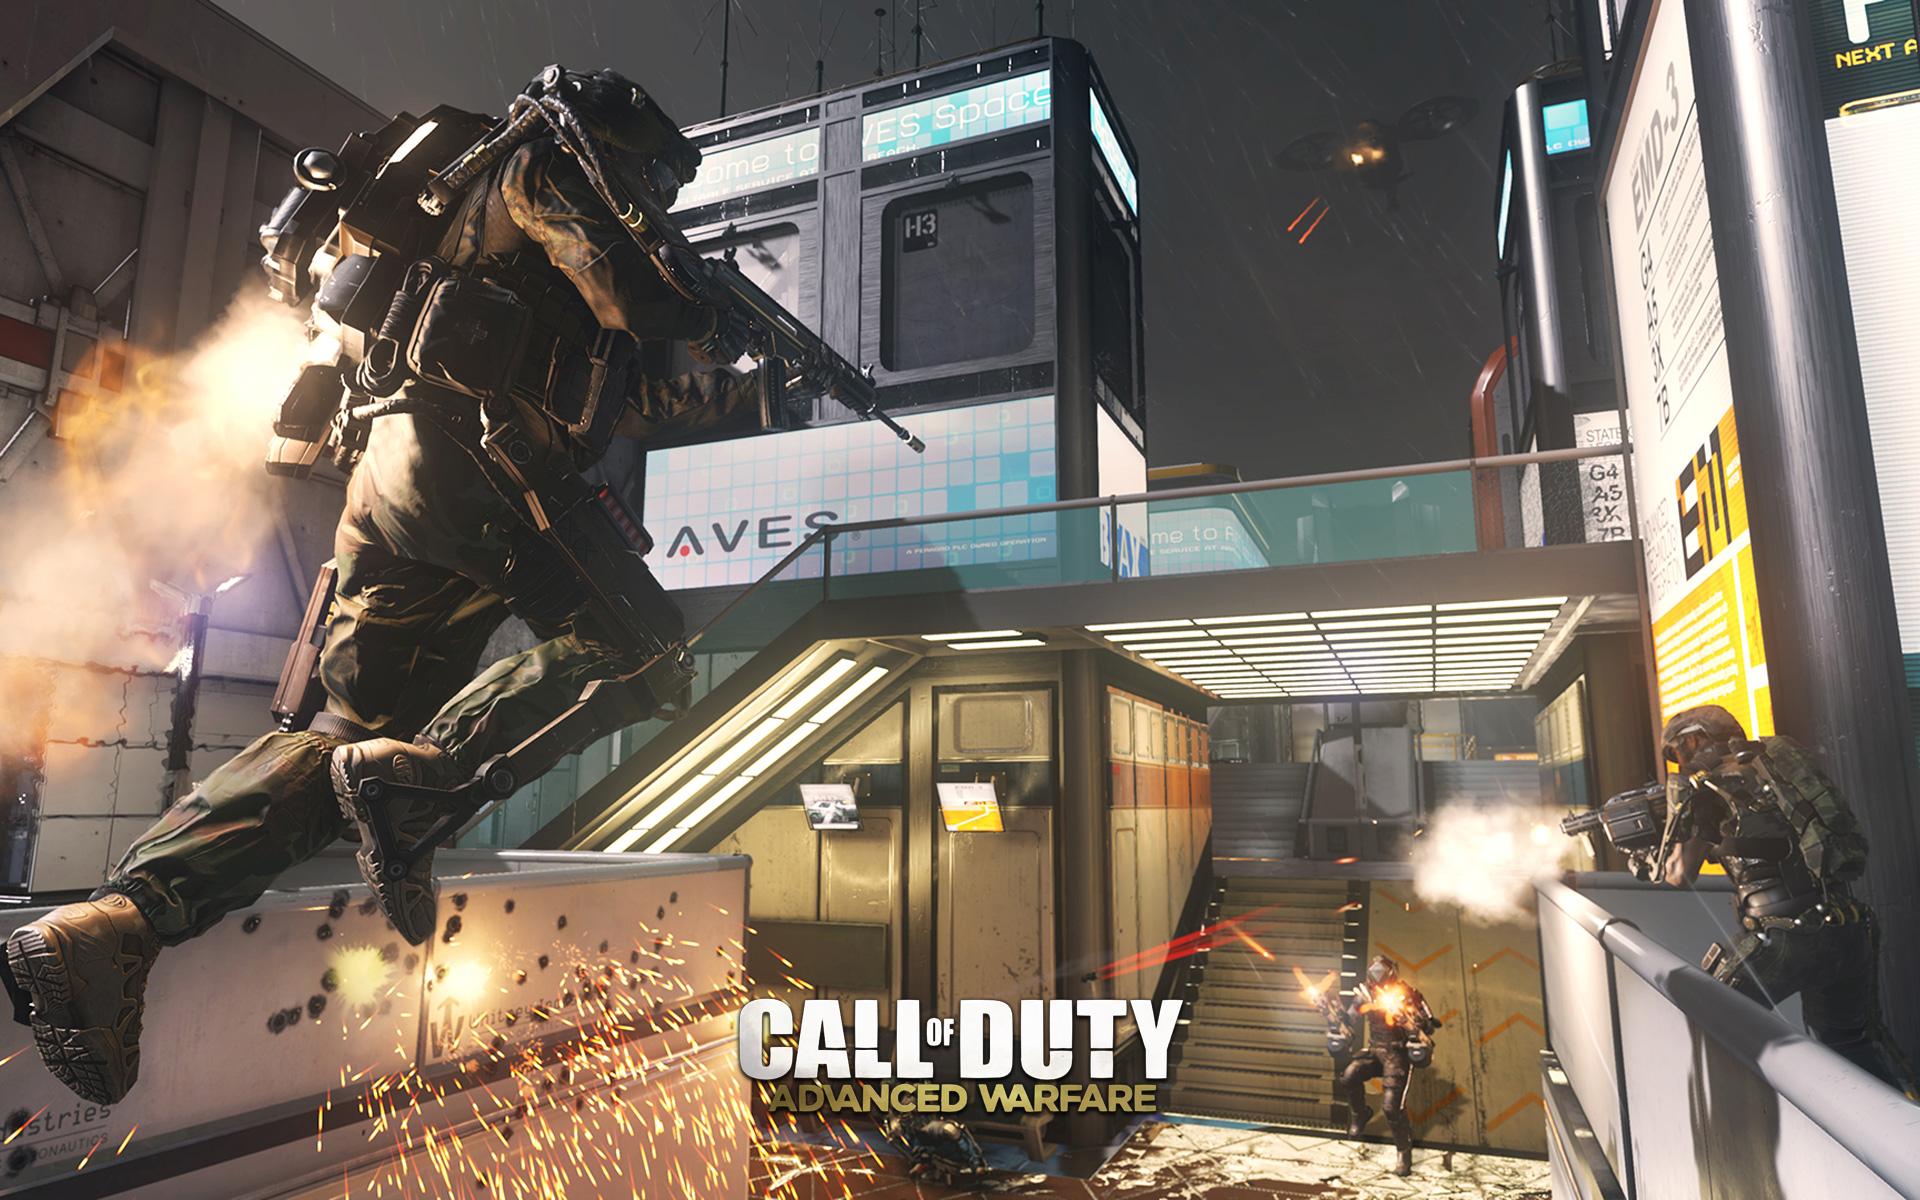 Free Call of Duty: Advanced Warfare Wallpaper in 1920x1200